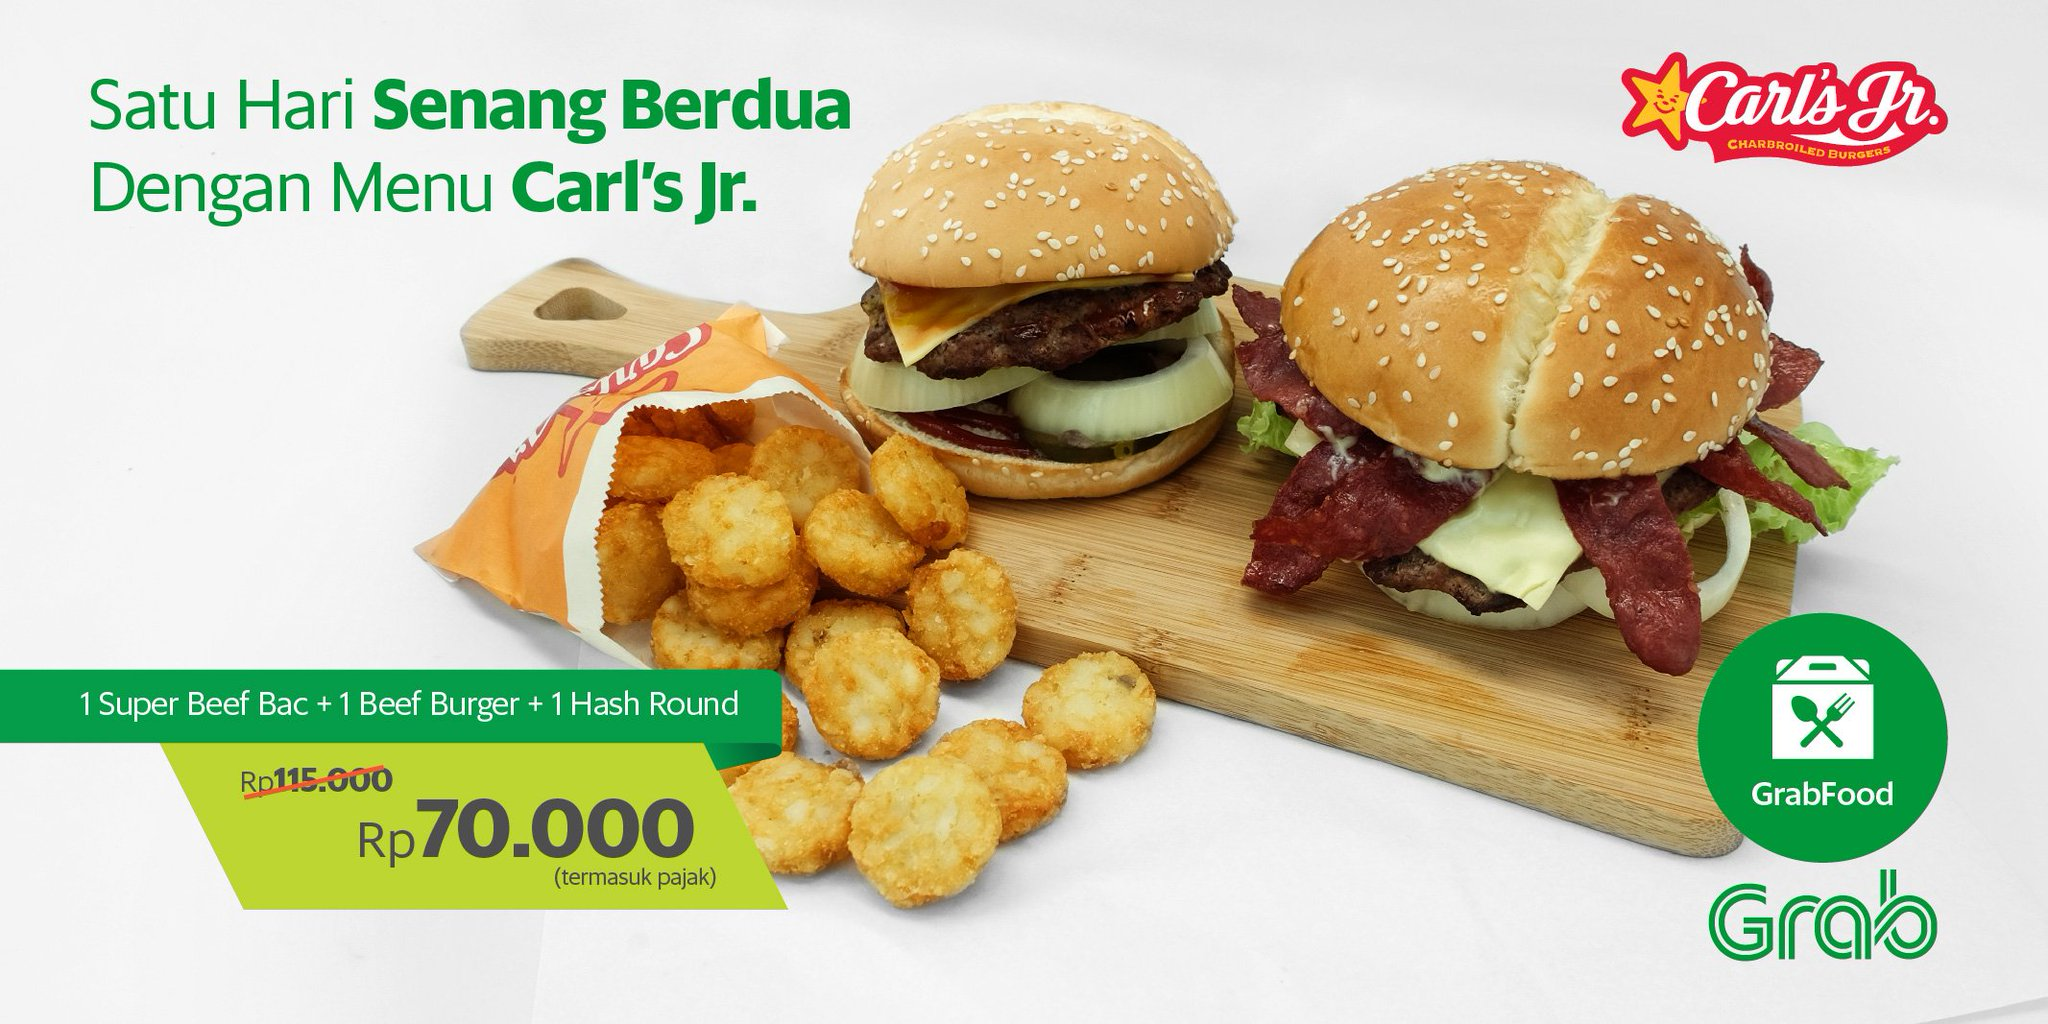 Grab Indonesia Pa Twitter Kenyang Ber2 Lbh Hemat Di Carl S Jr Enaknya Super Beef Bac Beef Burger Hash Round Cuma 70ribu Yuk Order Https T Co Lfohd1ia89 Https T Co V5eqmoyrtv